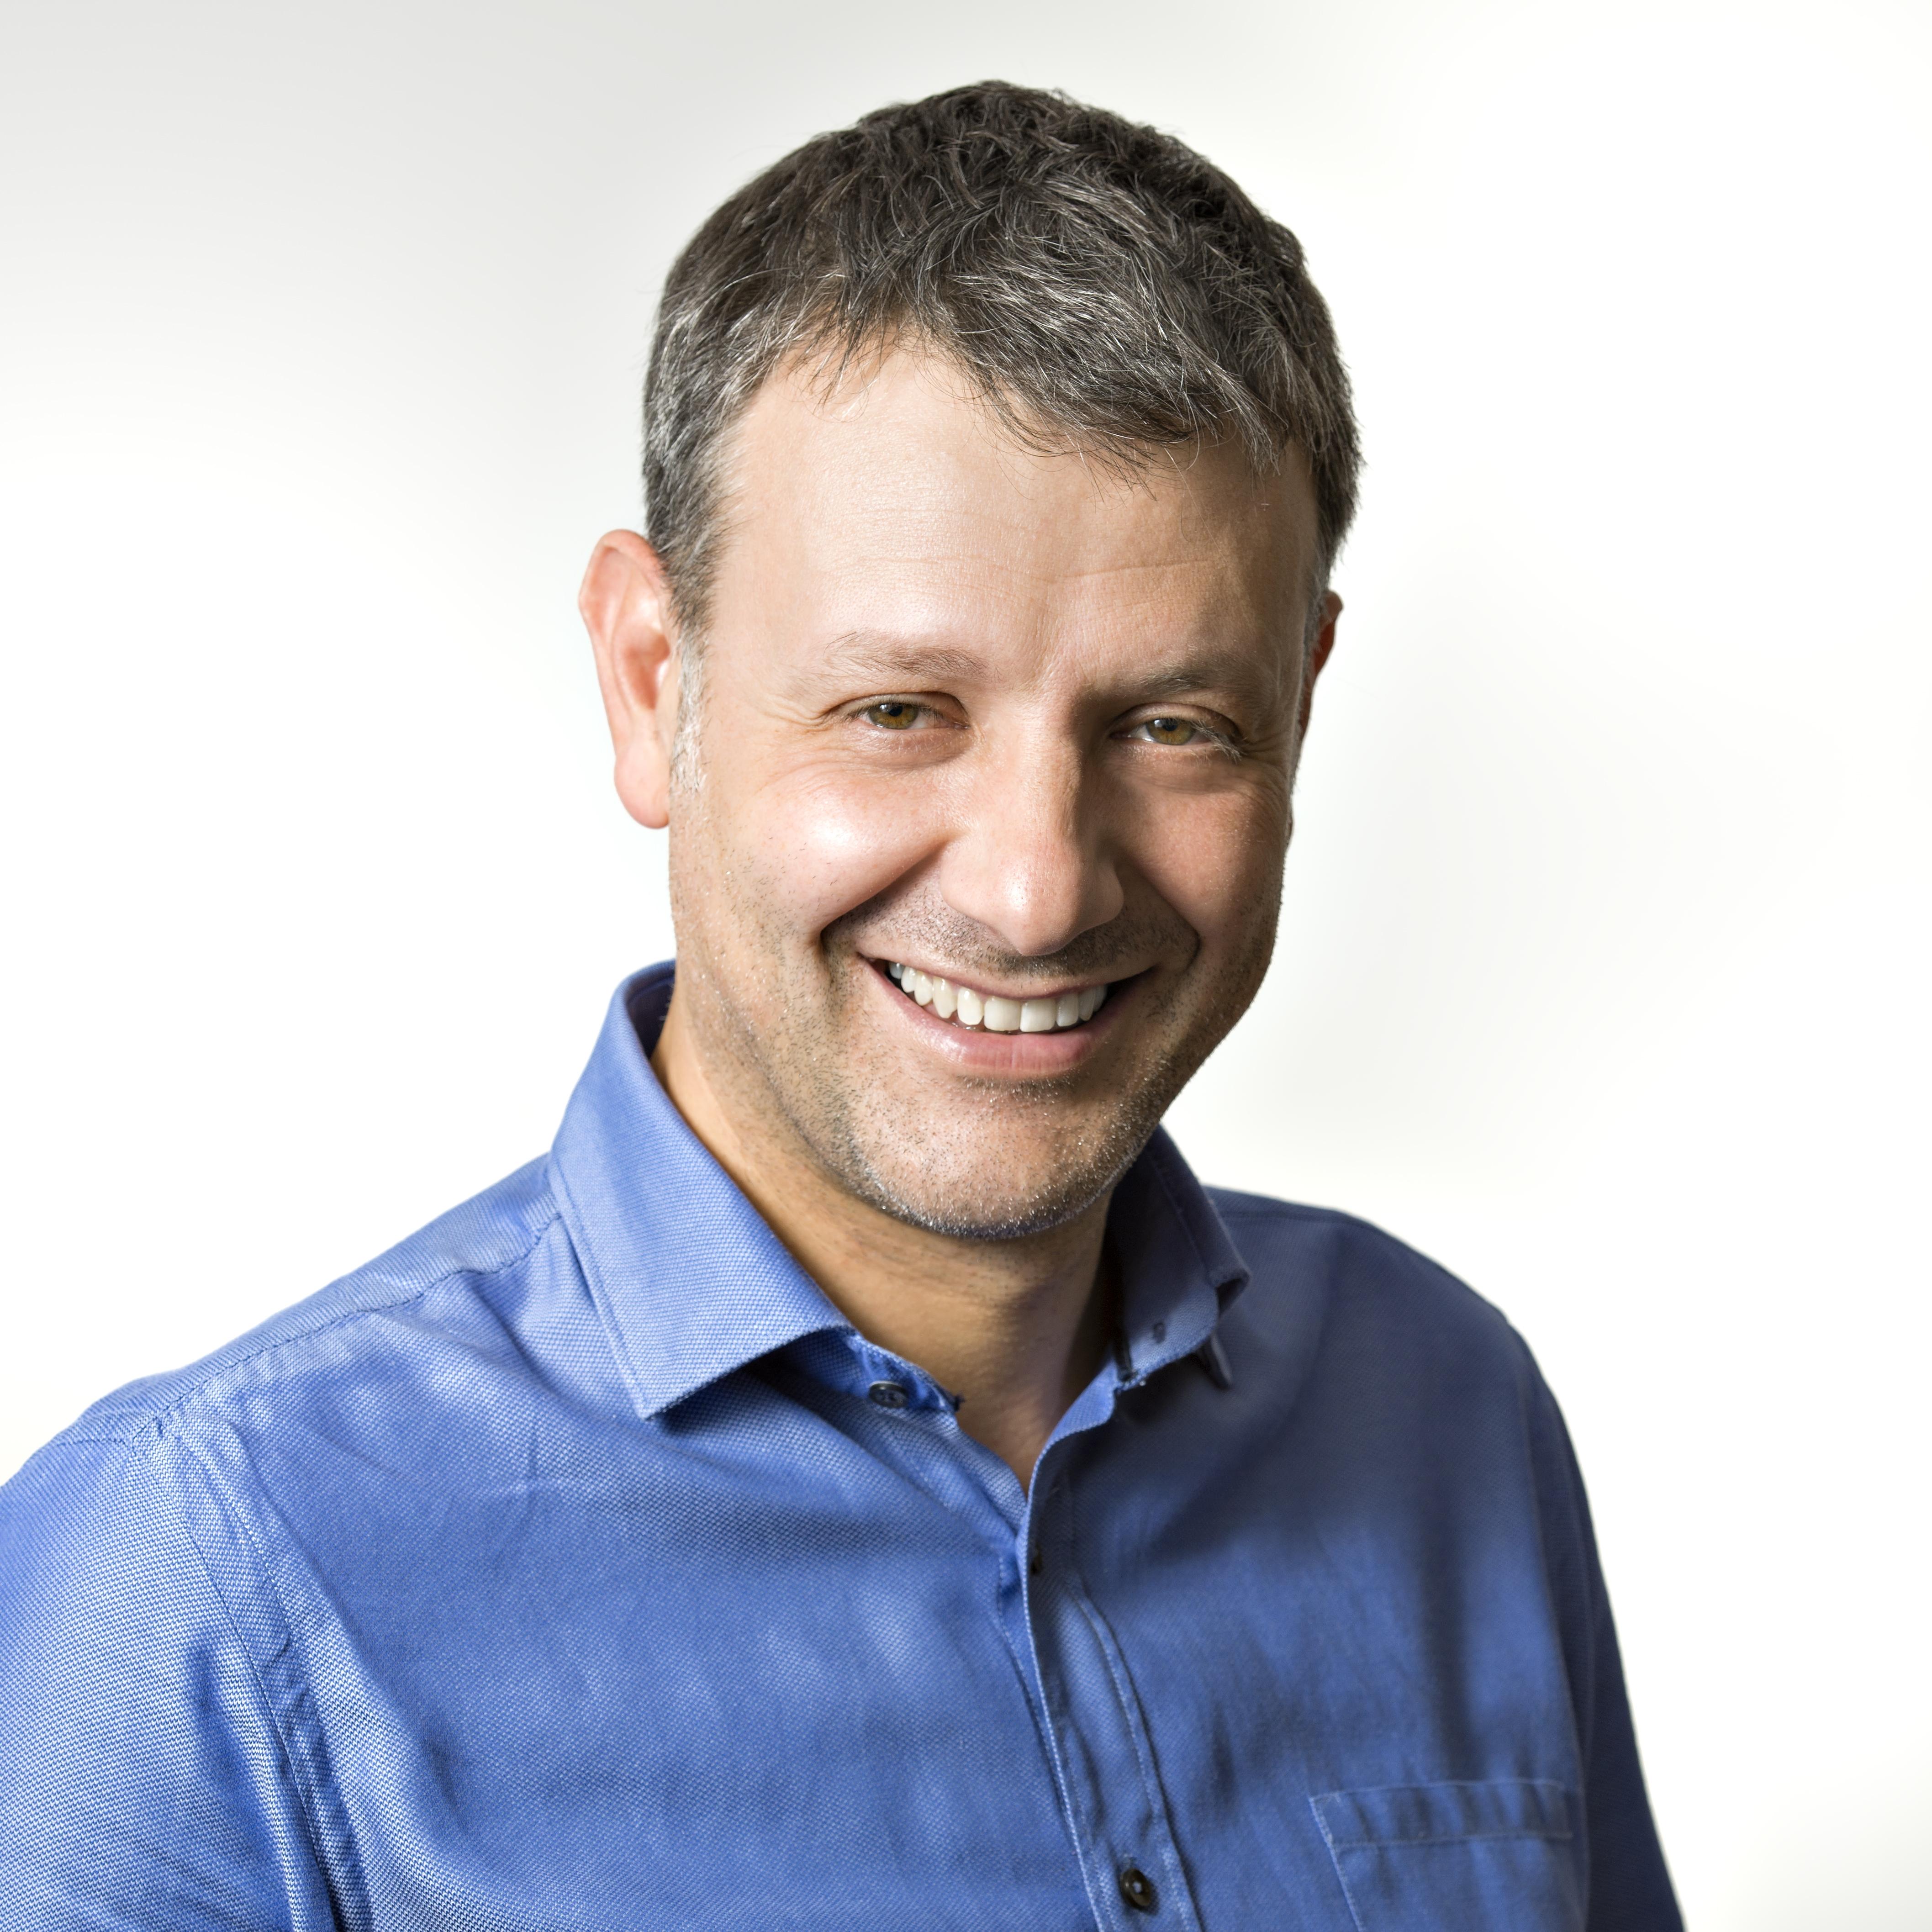 Piergiorgio De Campo, Presidente Noovle